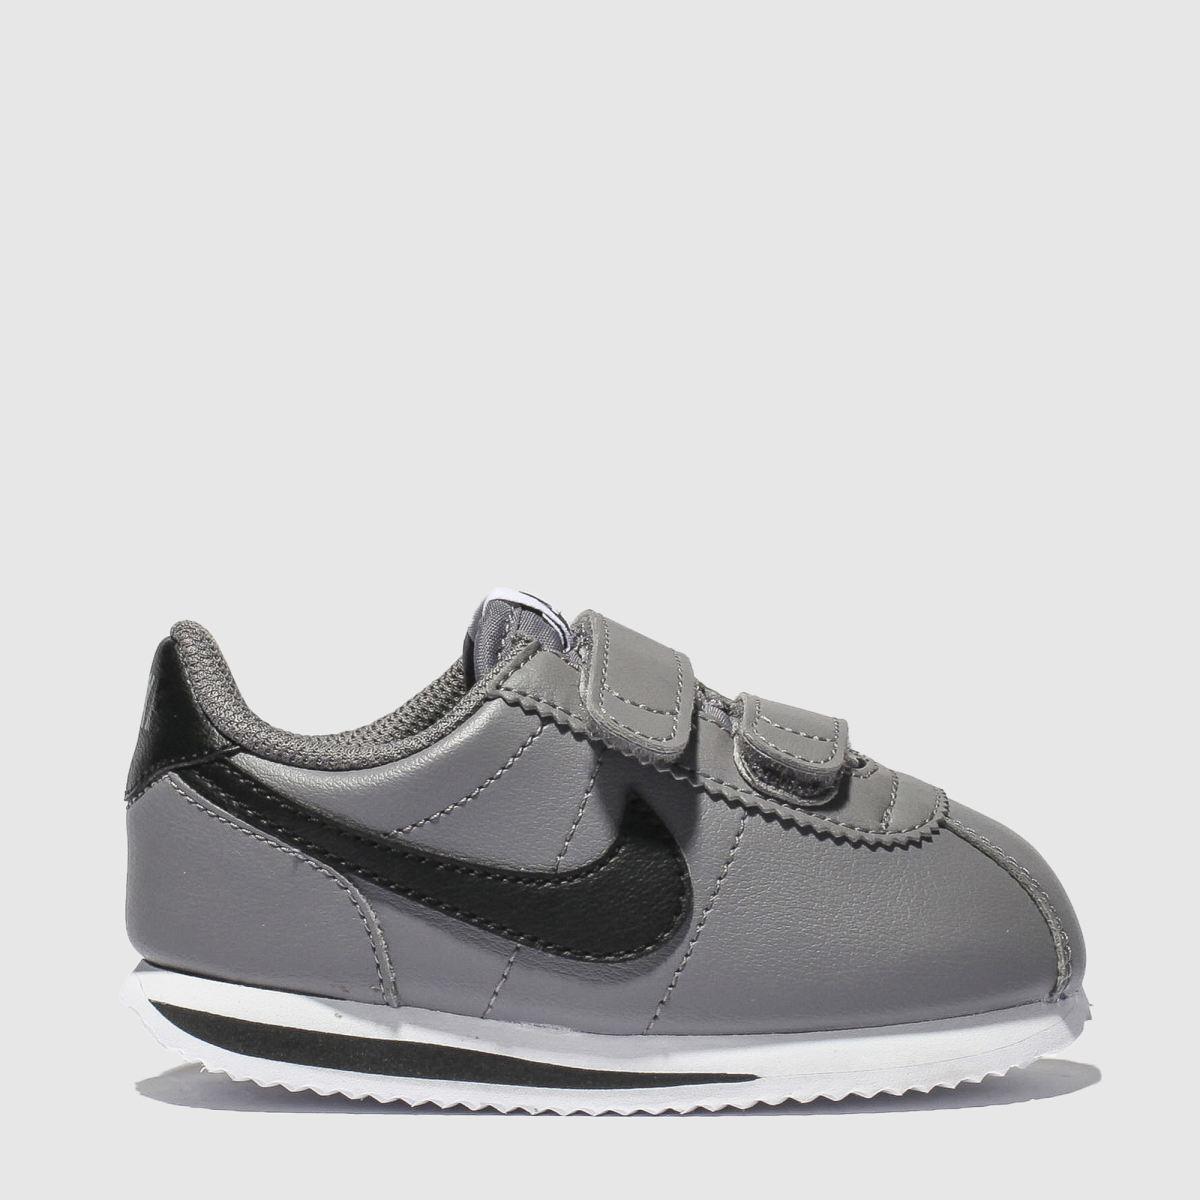 Nike Light Grey Cortez Basic Trainers Toddler